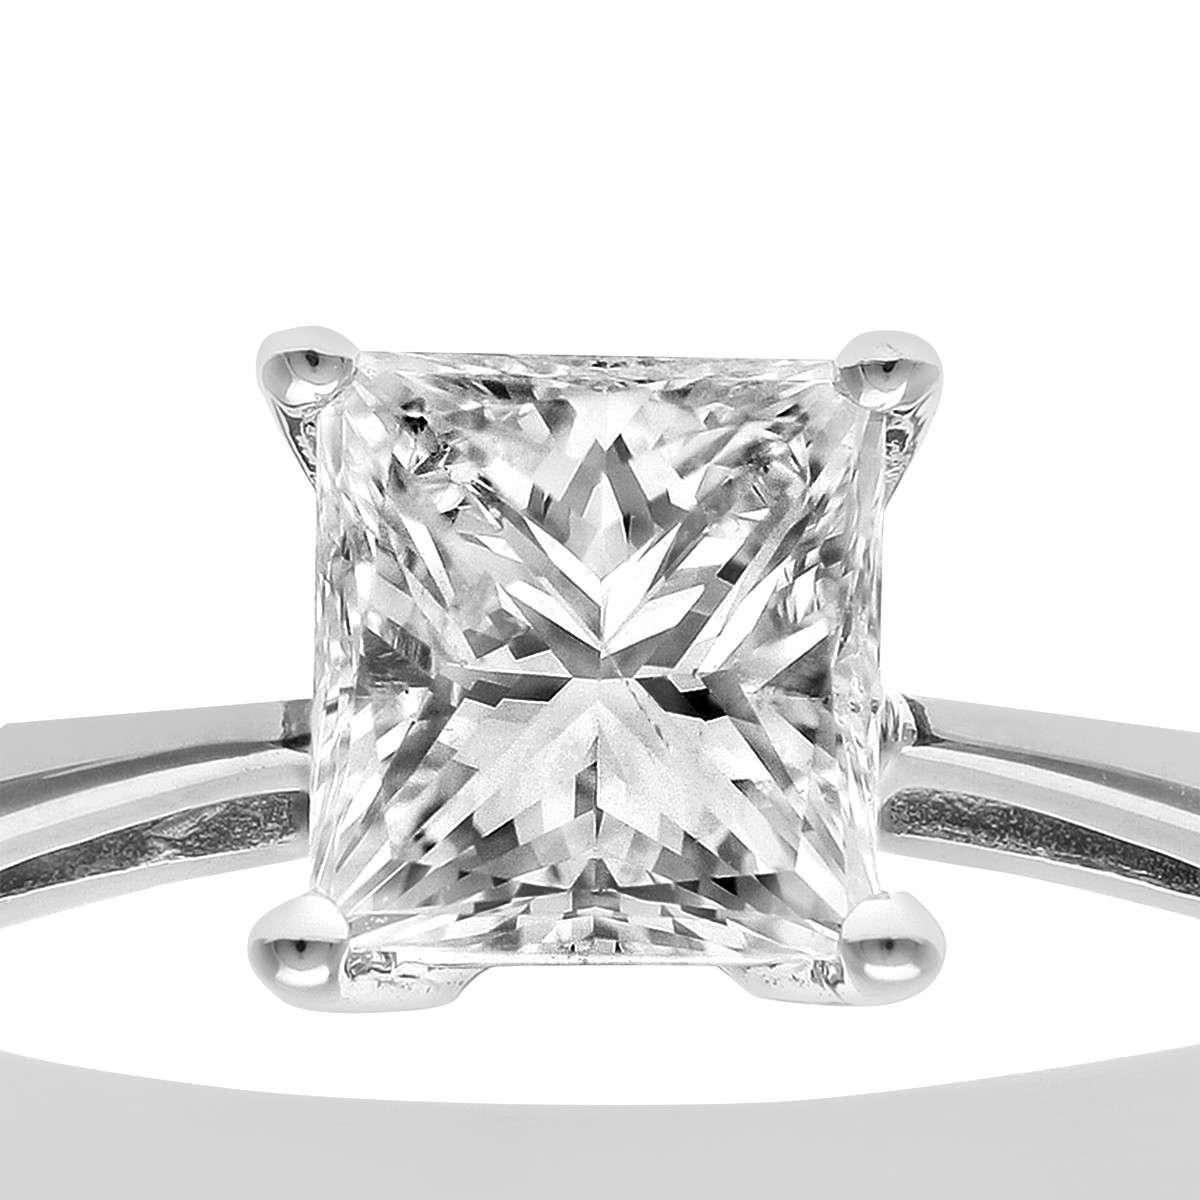 18CT WHITE GOLD 1.00CT DIAMOND PRINCESS CUT RING